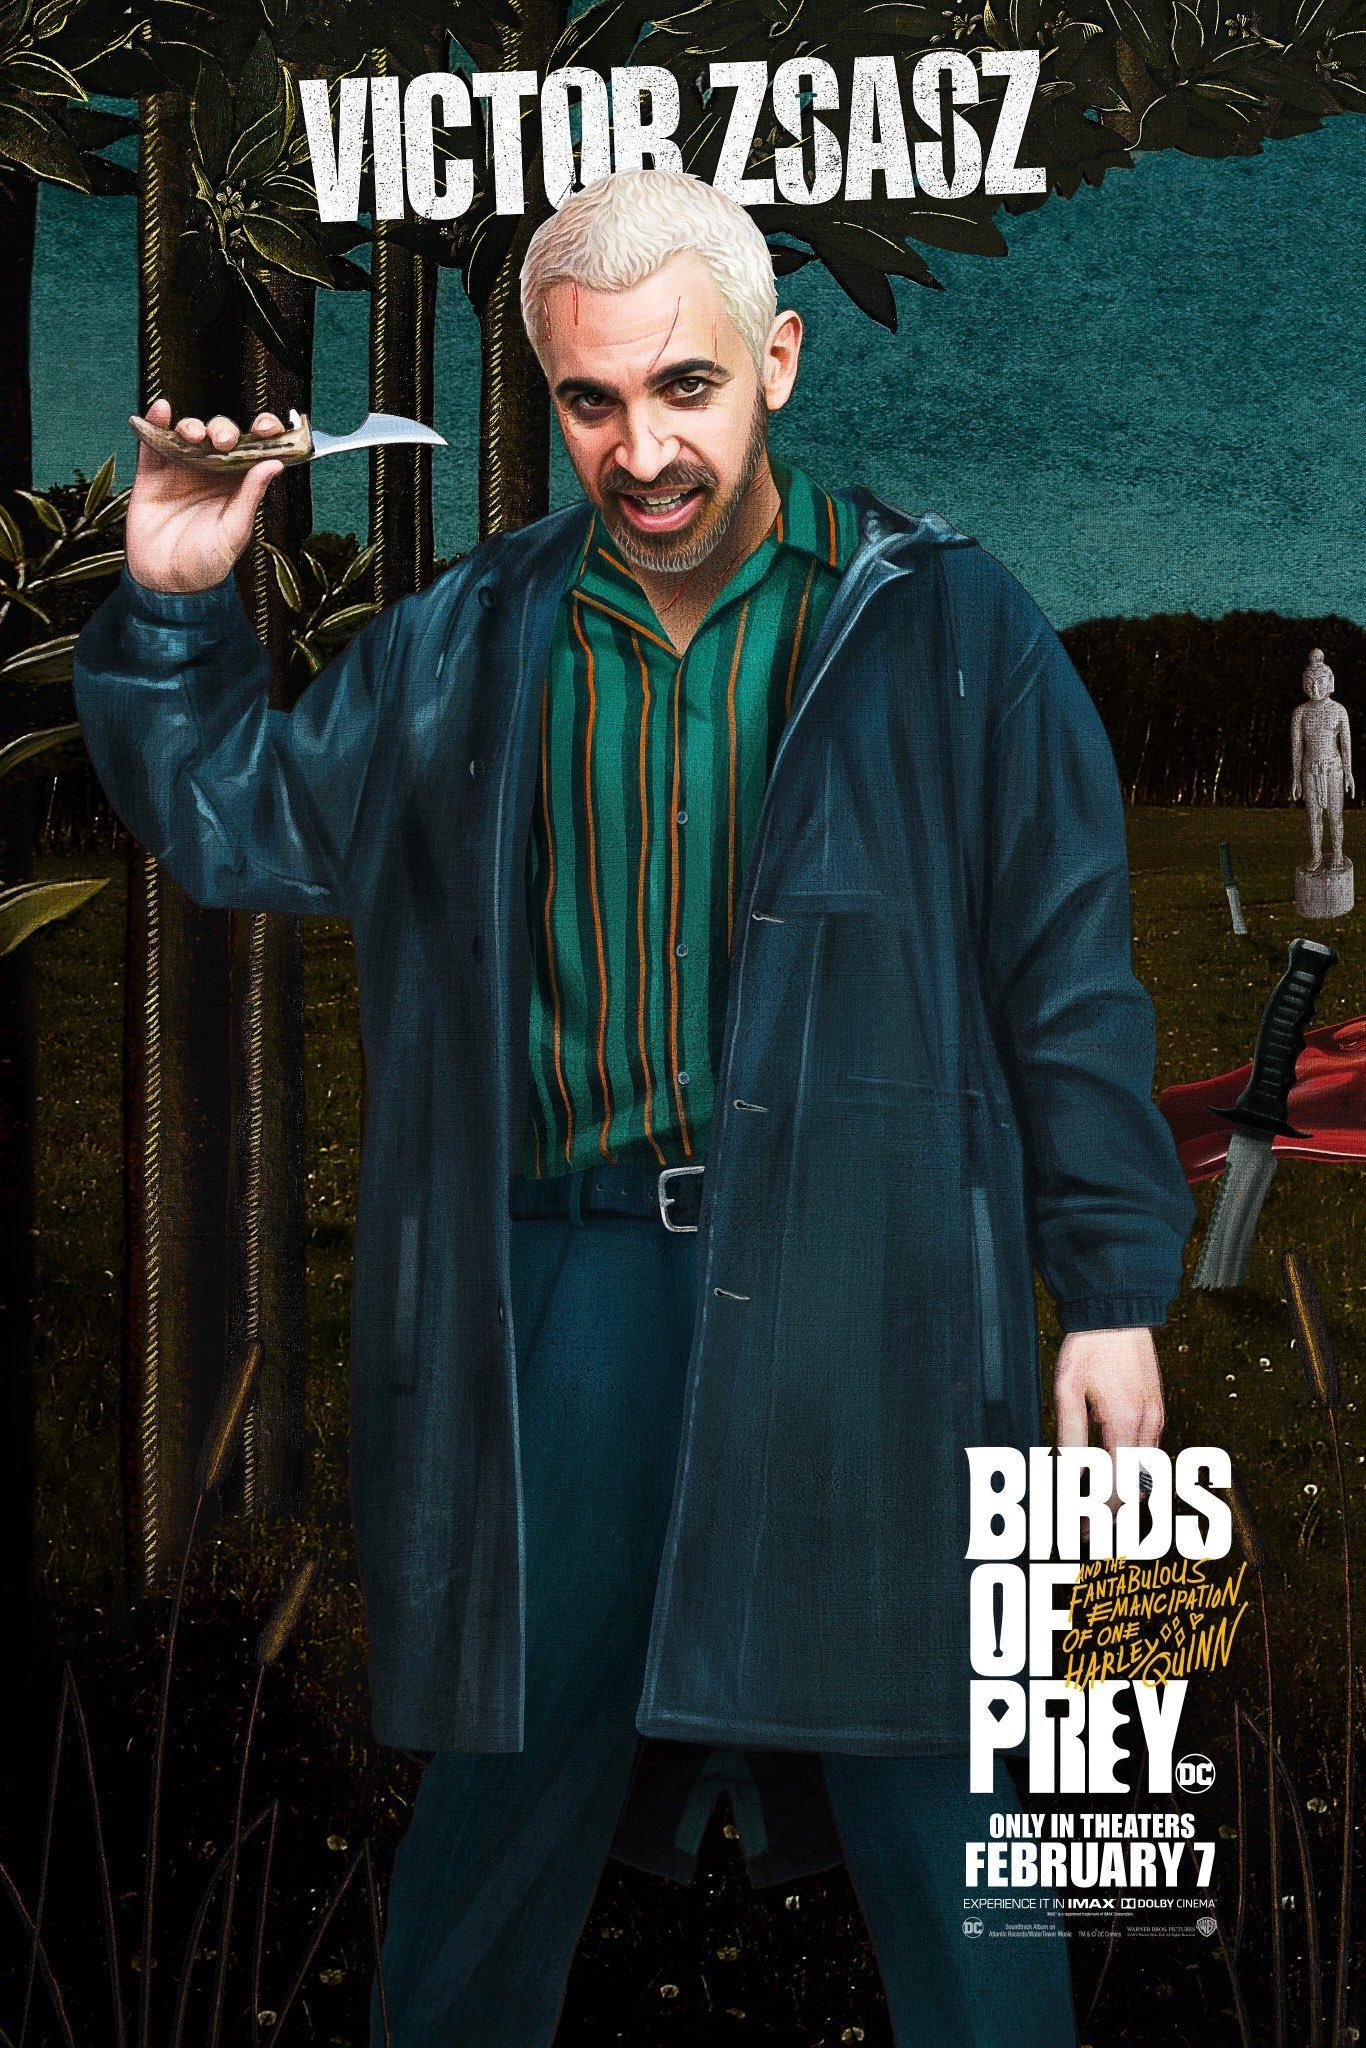 szmk_birds_of_prey_ragadozo_madarak_harley_quinn_csodasztikus_felszabadulasa_dc_batman_gotham_joker_baseball_bruce_9.jpg